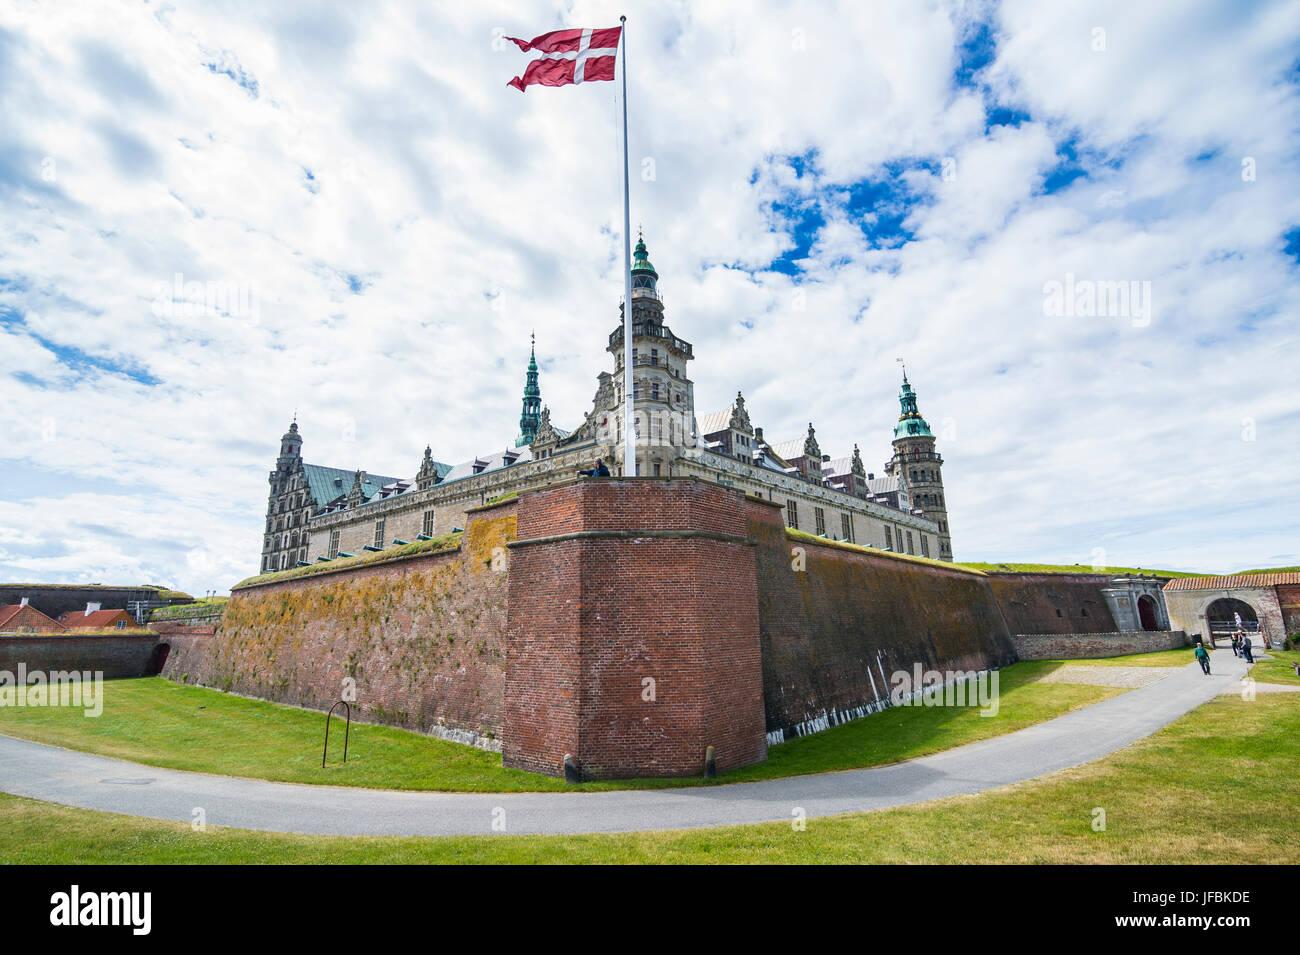 Unesco world heritage sight Kronborg renaissance castle, Helsingor, Denmark - Stock Image